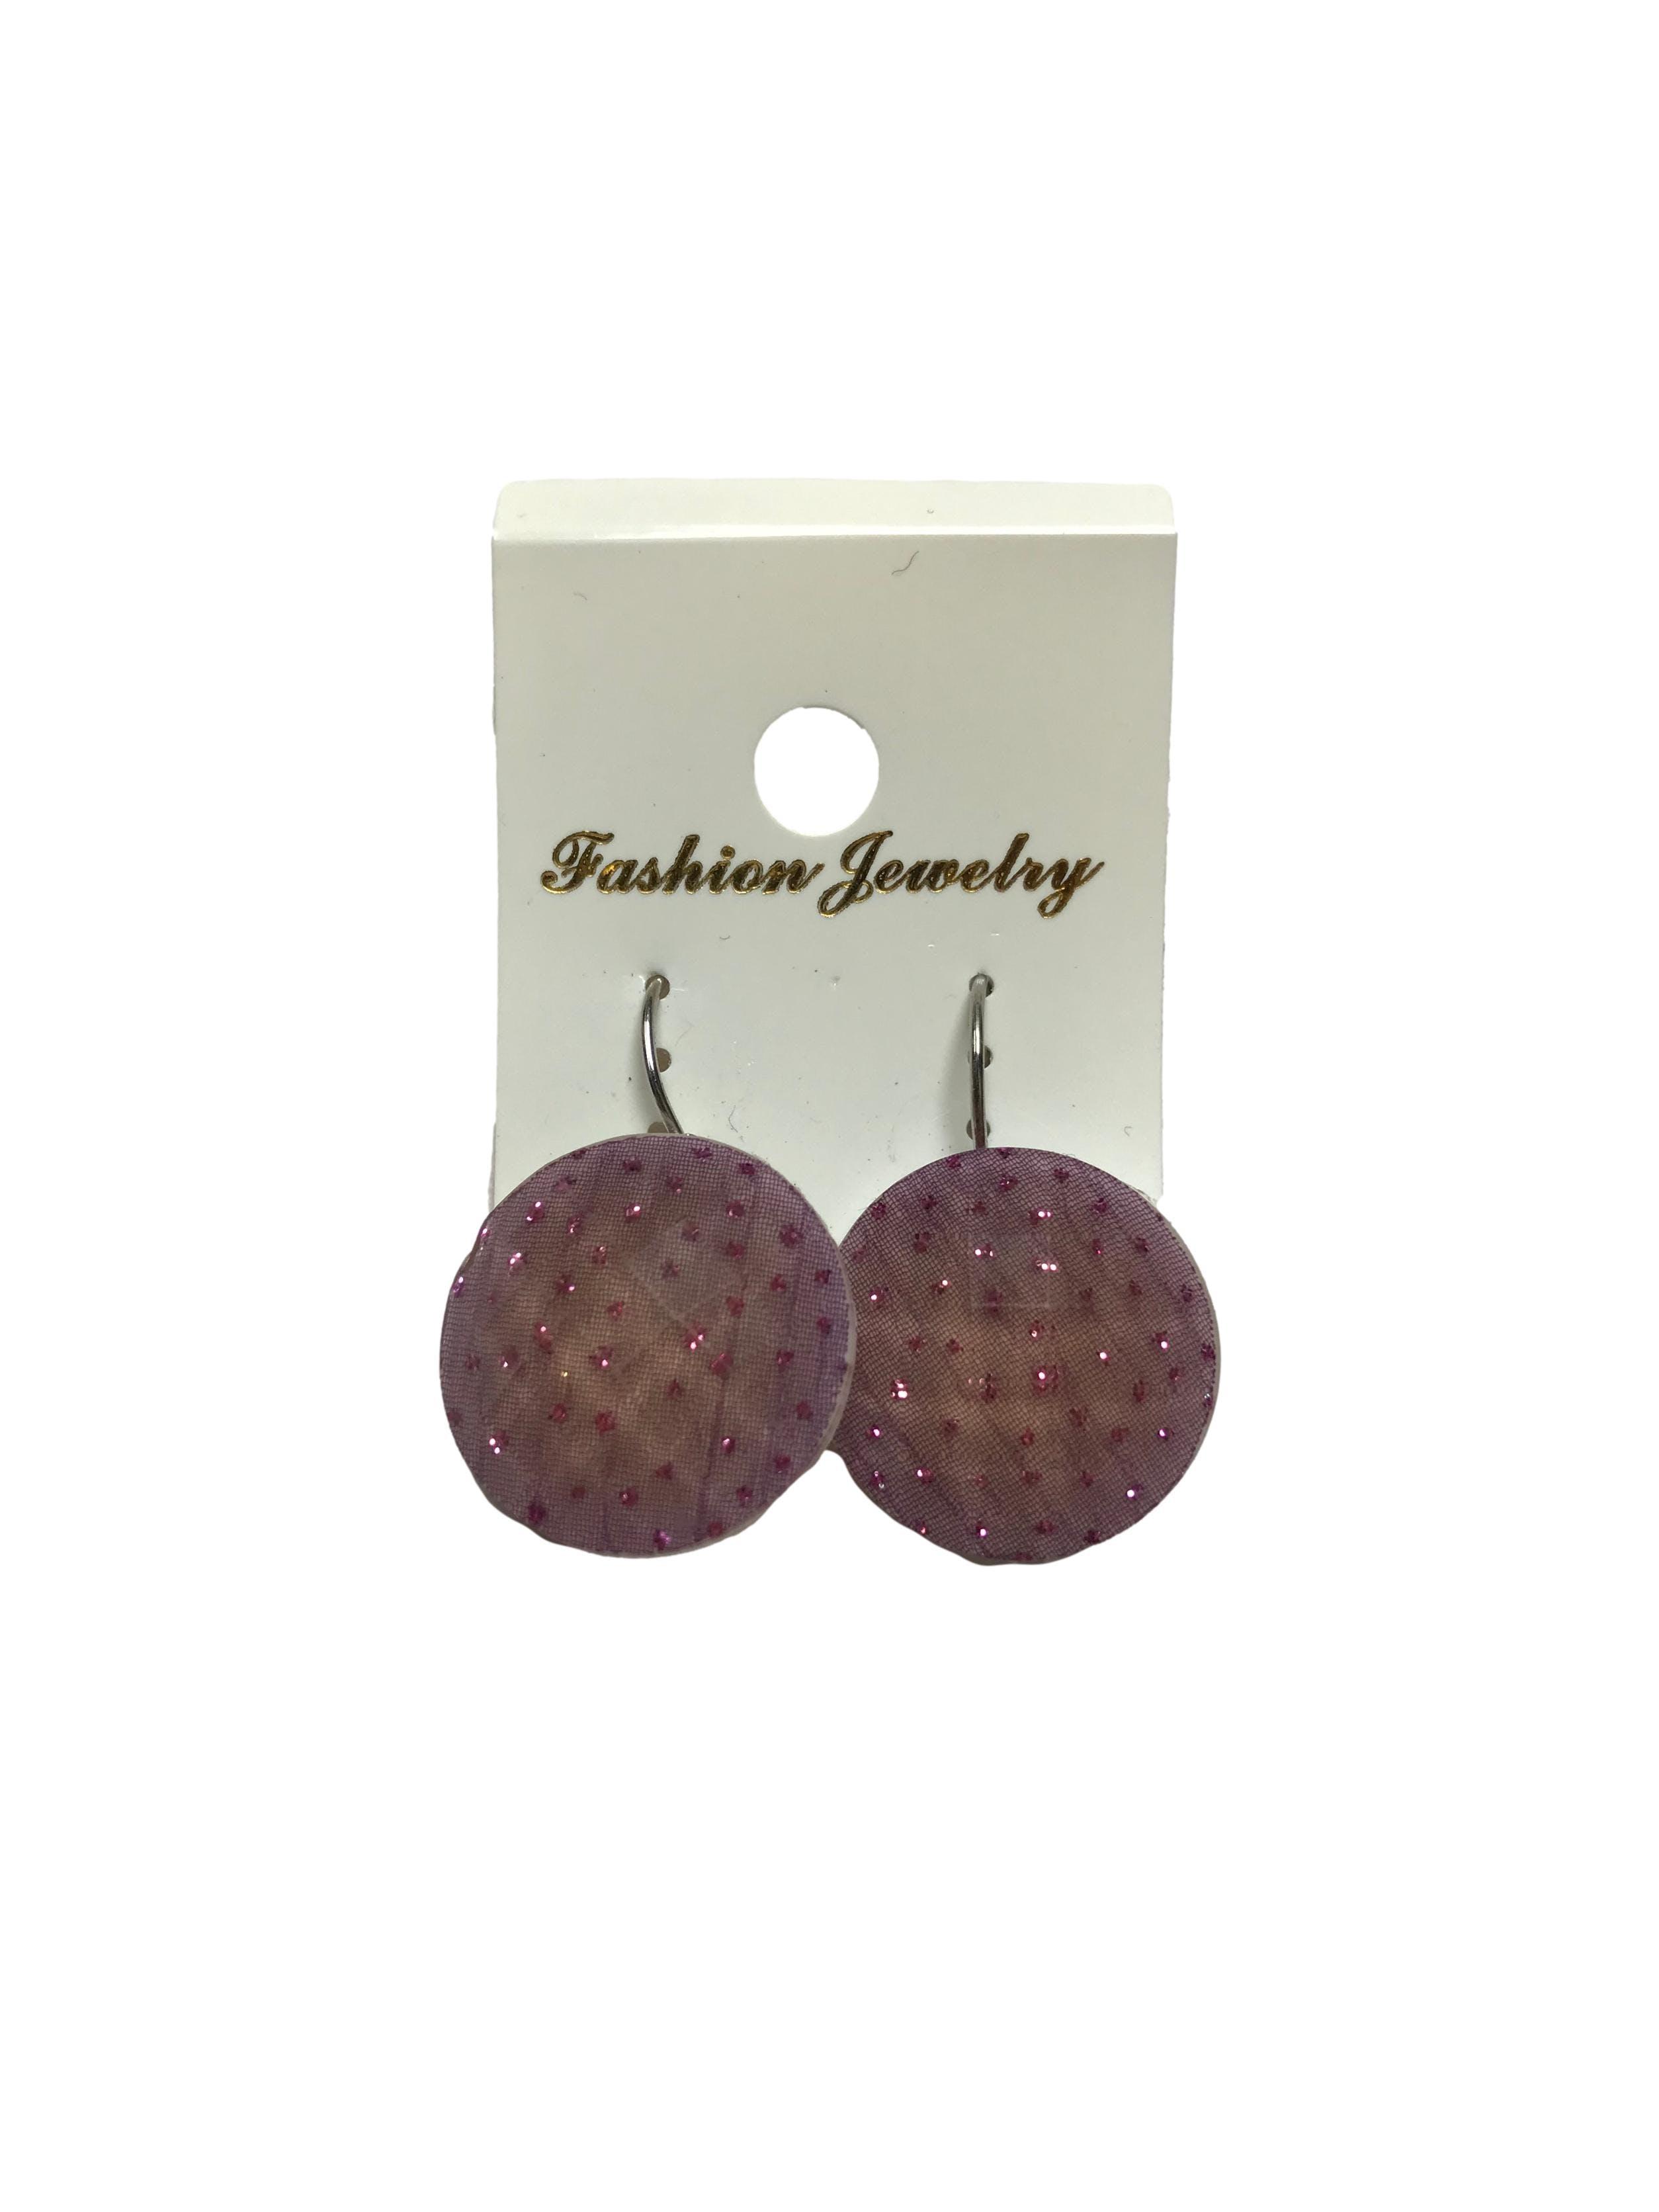 Aretes de acrílico facetado lila con puntisos escarchados. Largo 3cm